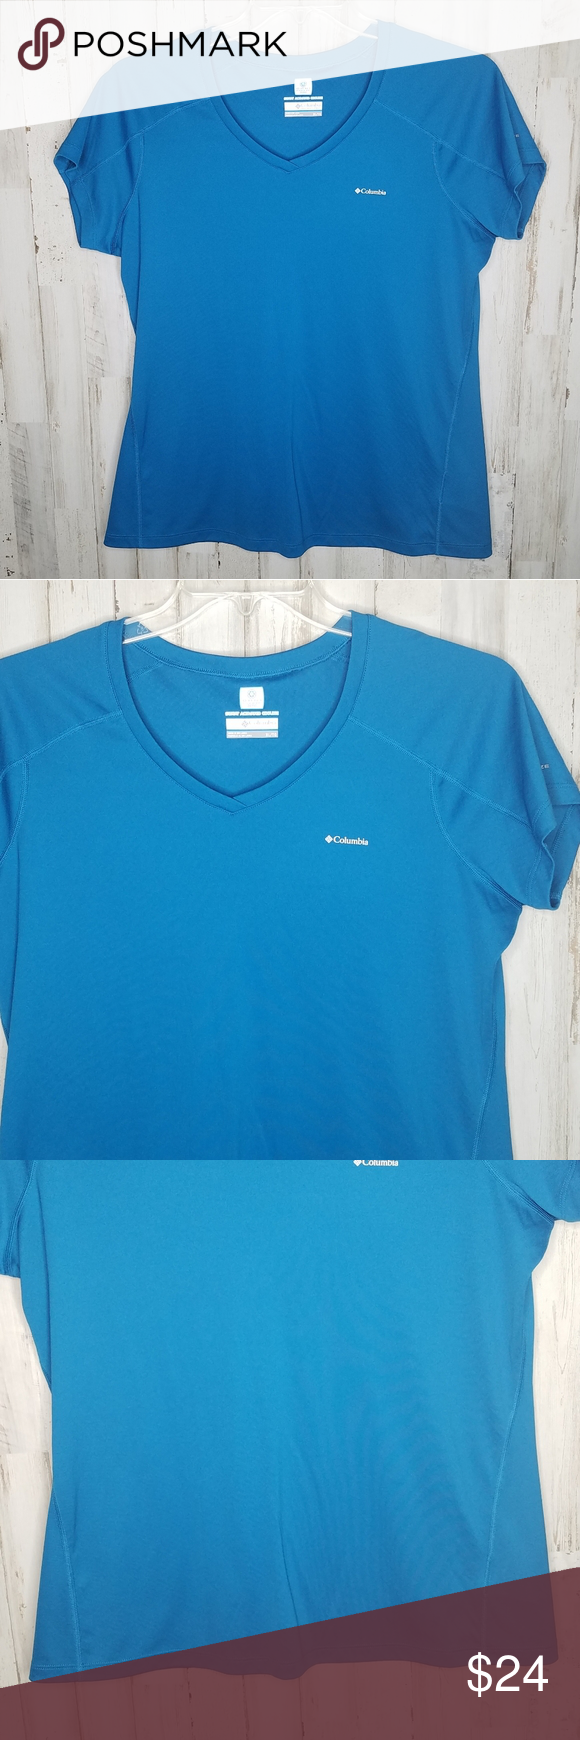 Columbia Omni Freeze Shirt Teal Short Sleeve Xl Columbia Omni